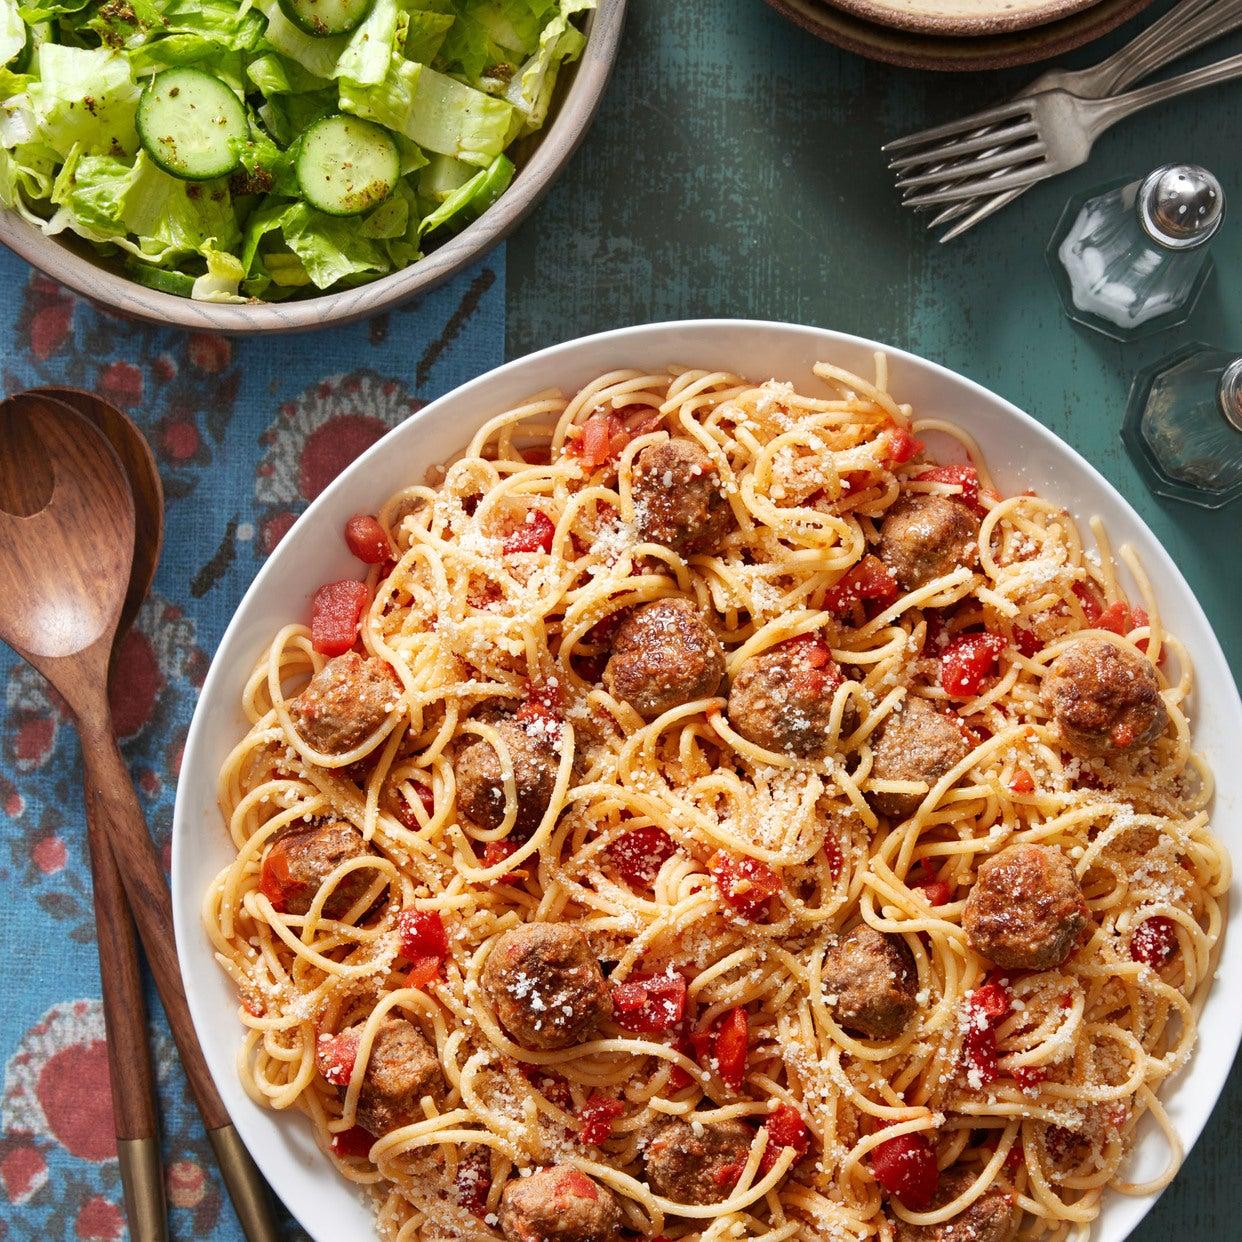 Spaghetti & Meatballs with Romaine Salad & Oregano Dressing